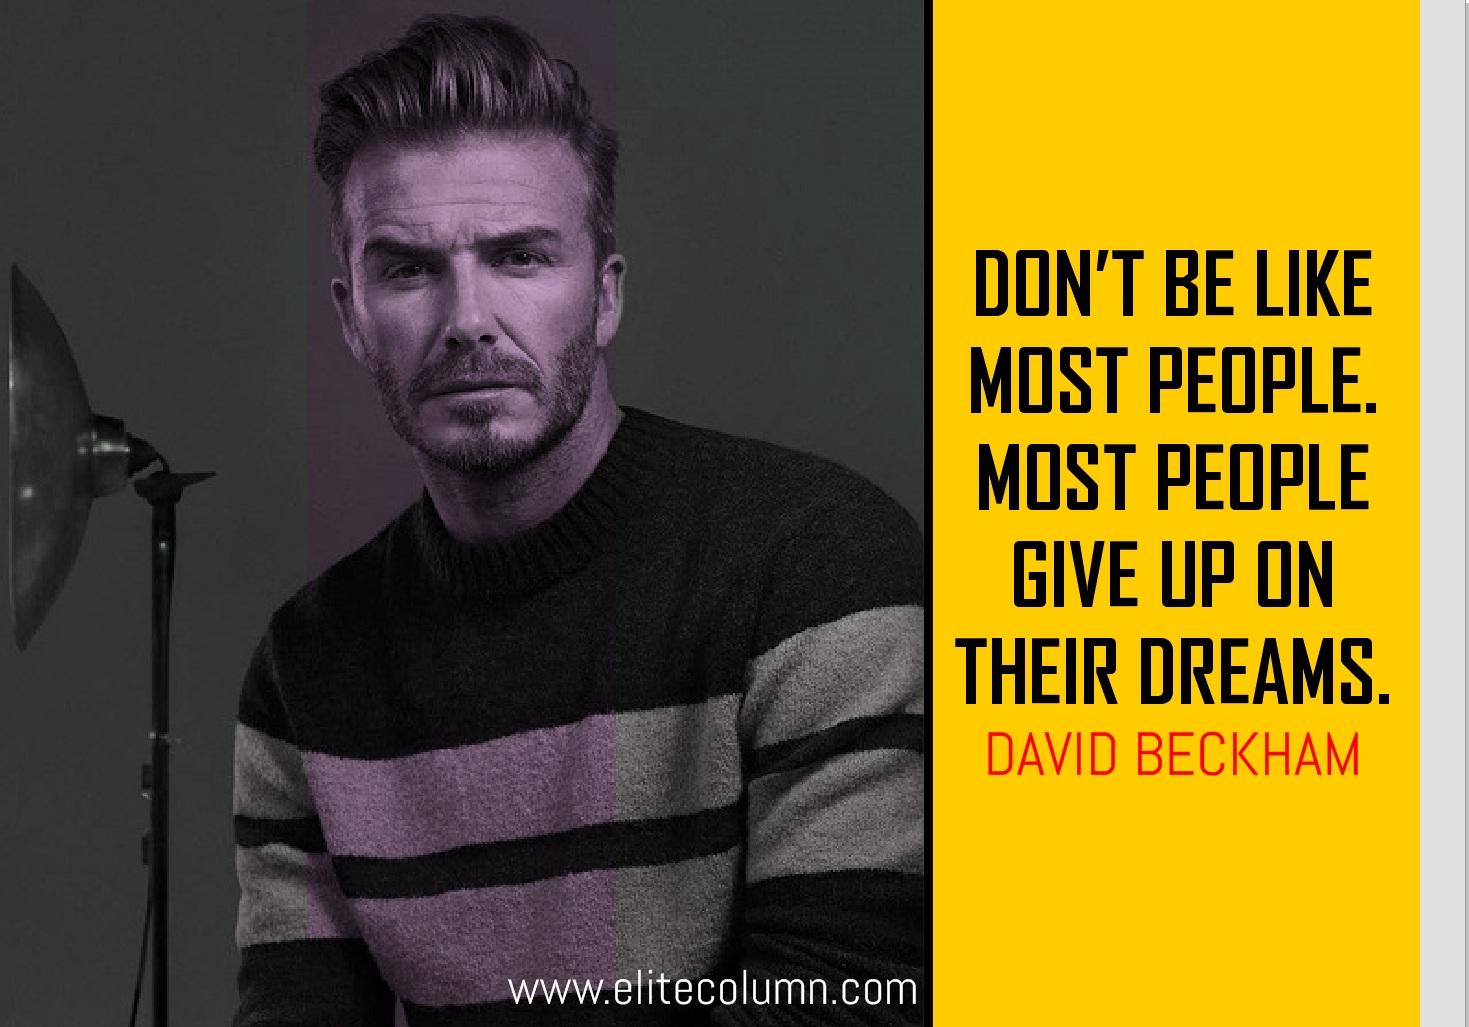 David Beckham Quotes 7 | EliteColumn